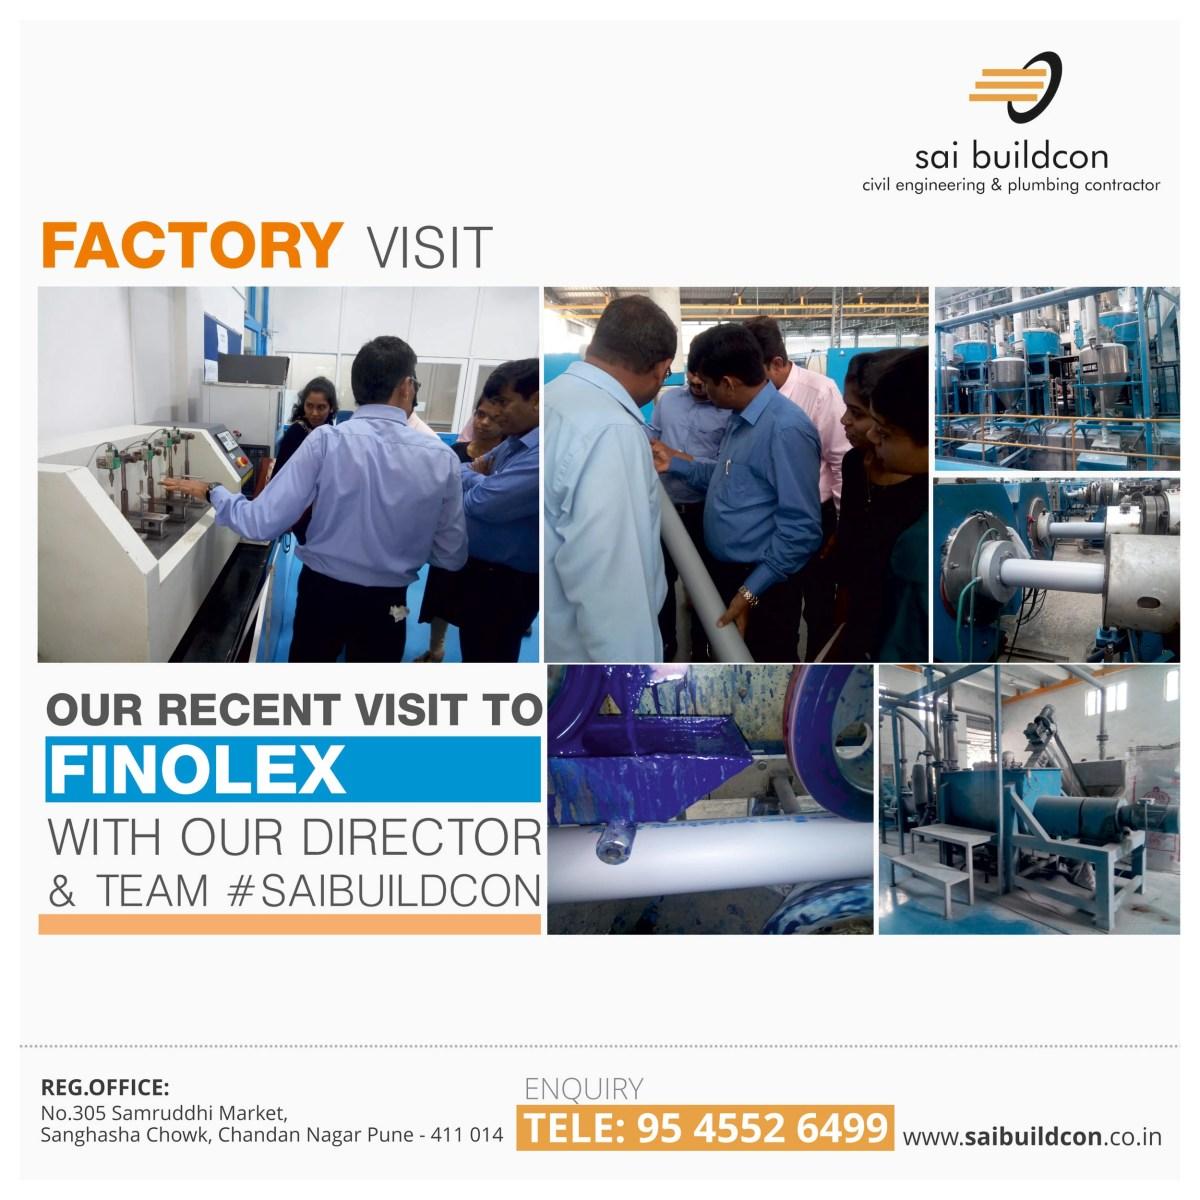 30-July-2018 Site Visit to Finolex by Sai Buildcon Team